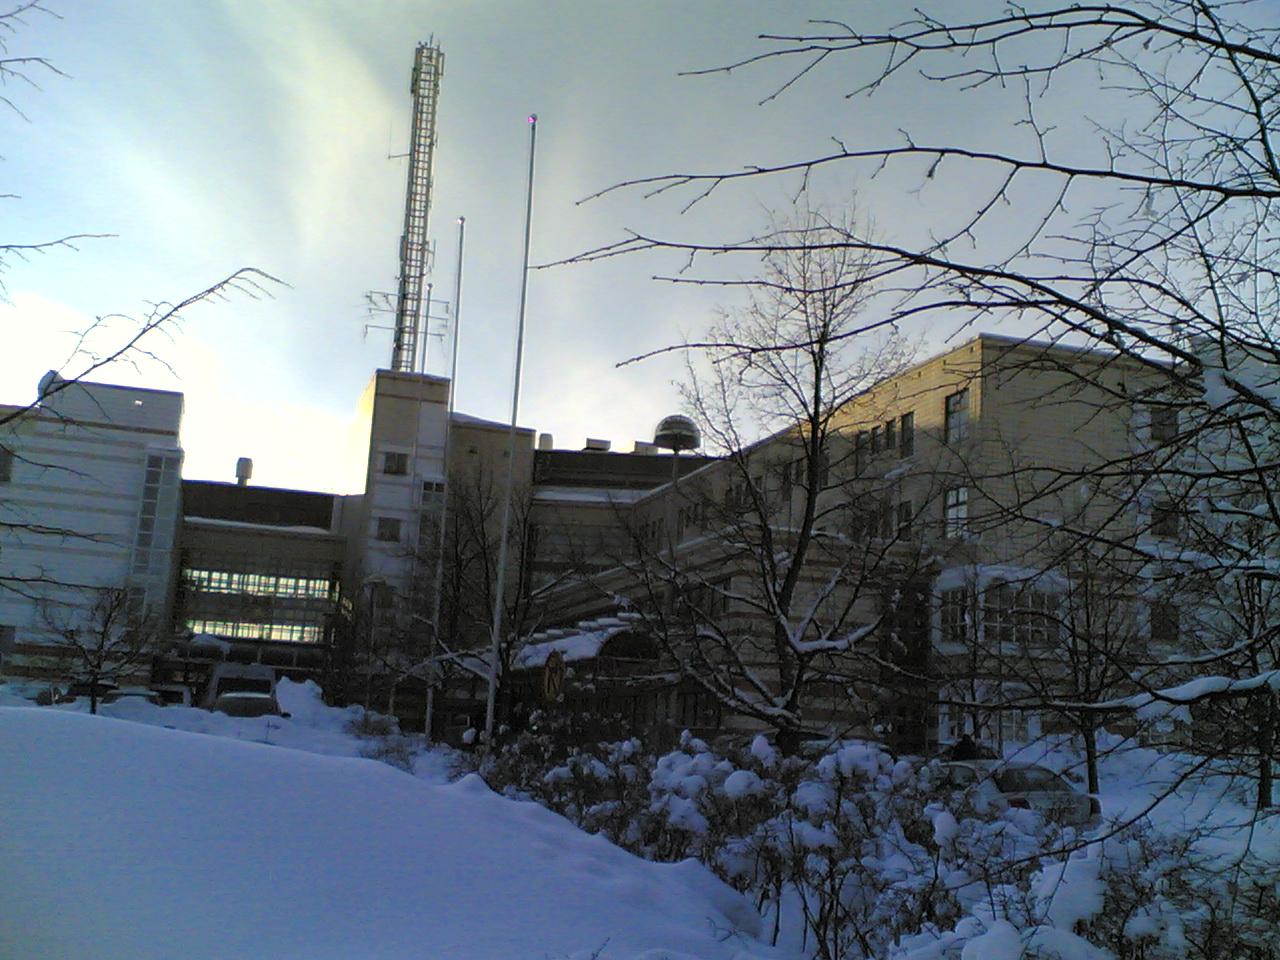 Sairaalakatu 1 Vantaa